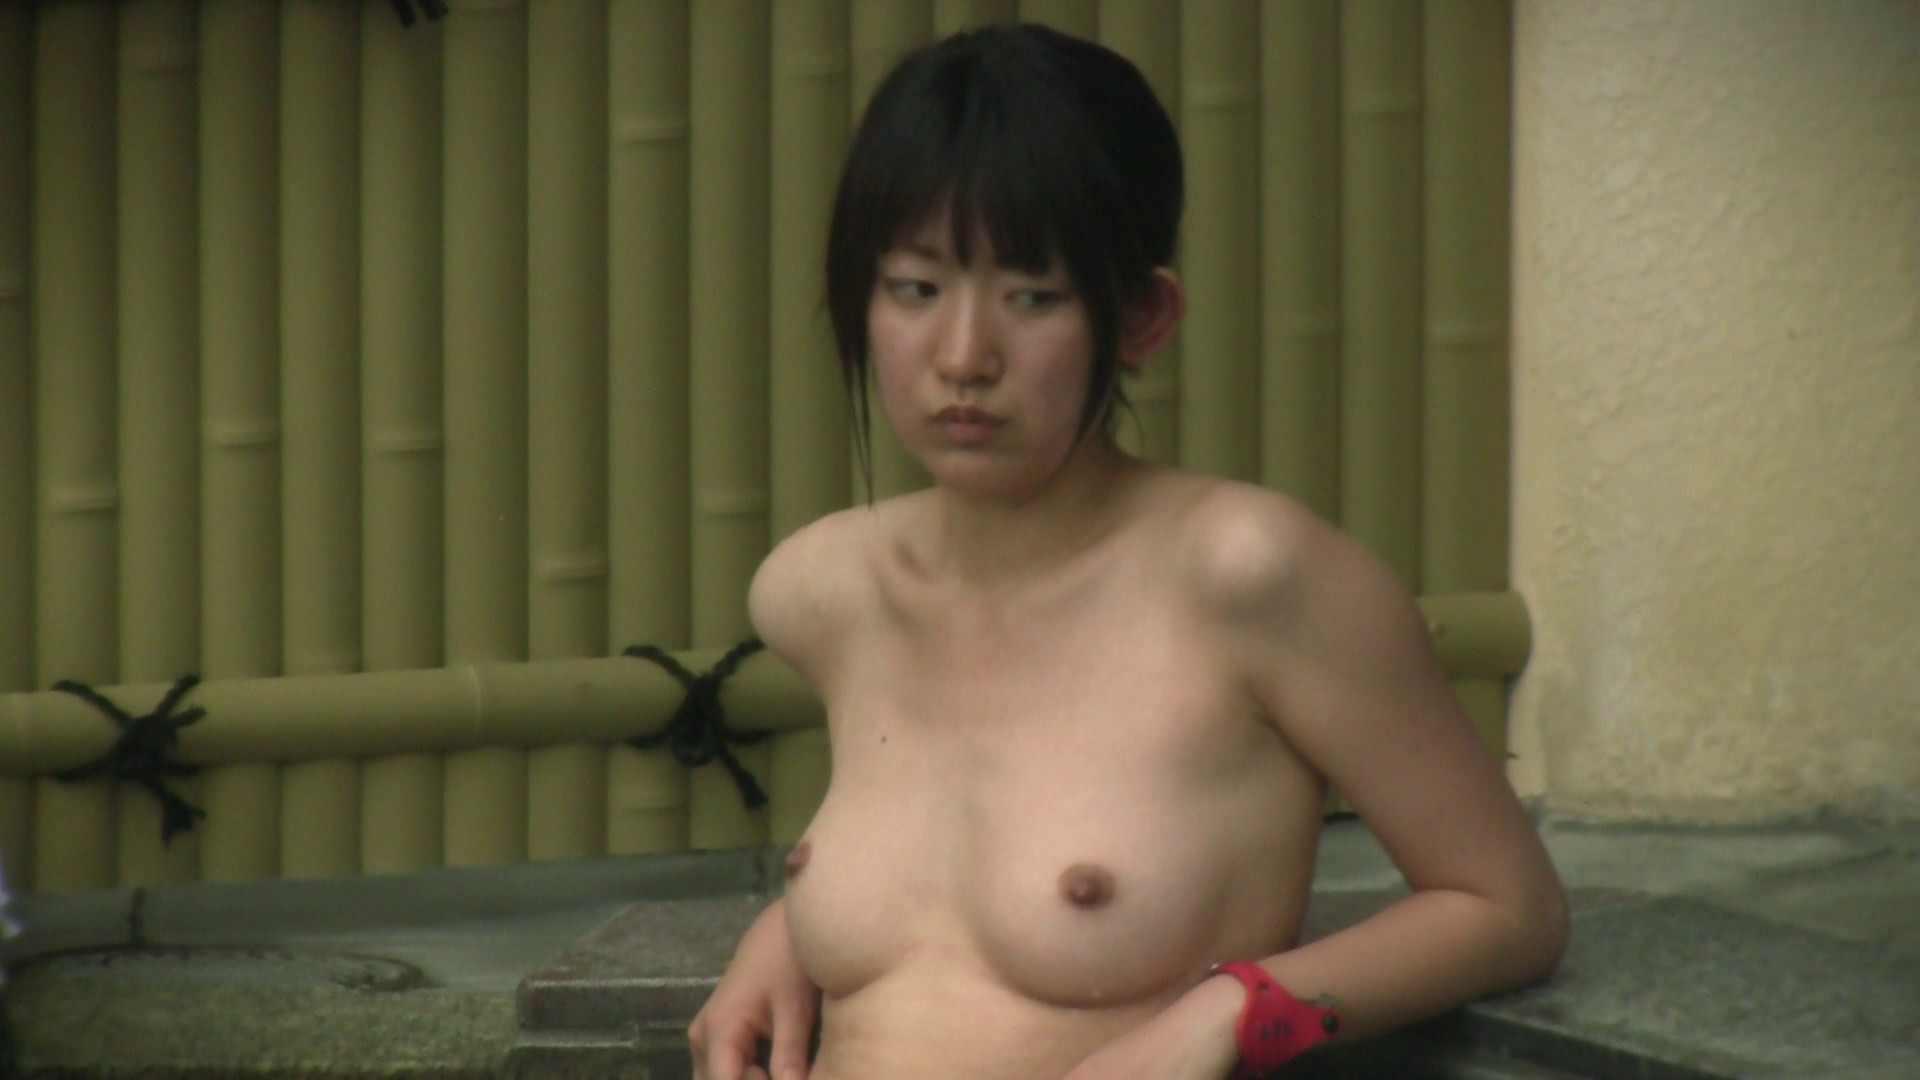 Aquaな露天風呂Vol.144 盗撮シリーズ   露天風呂編  96PIX 11